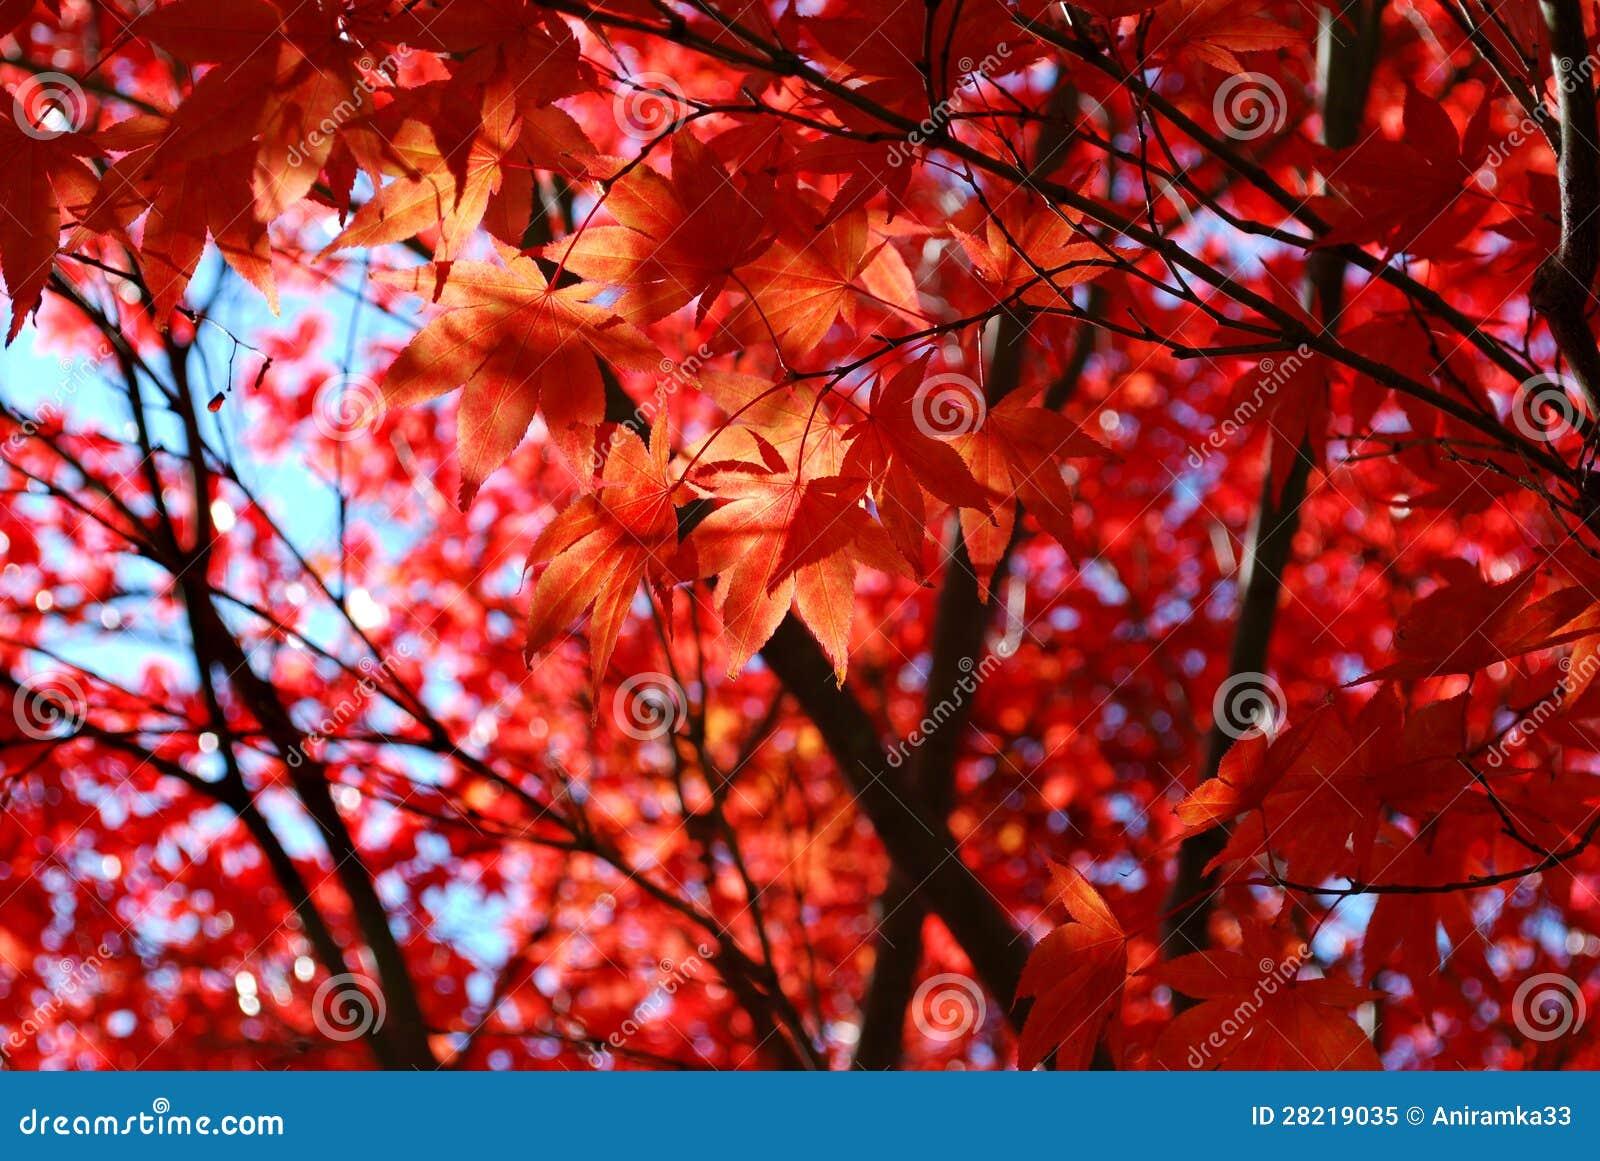 Follaje rojo del arce japonés